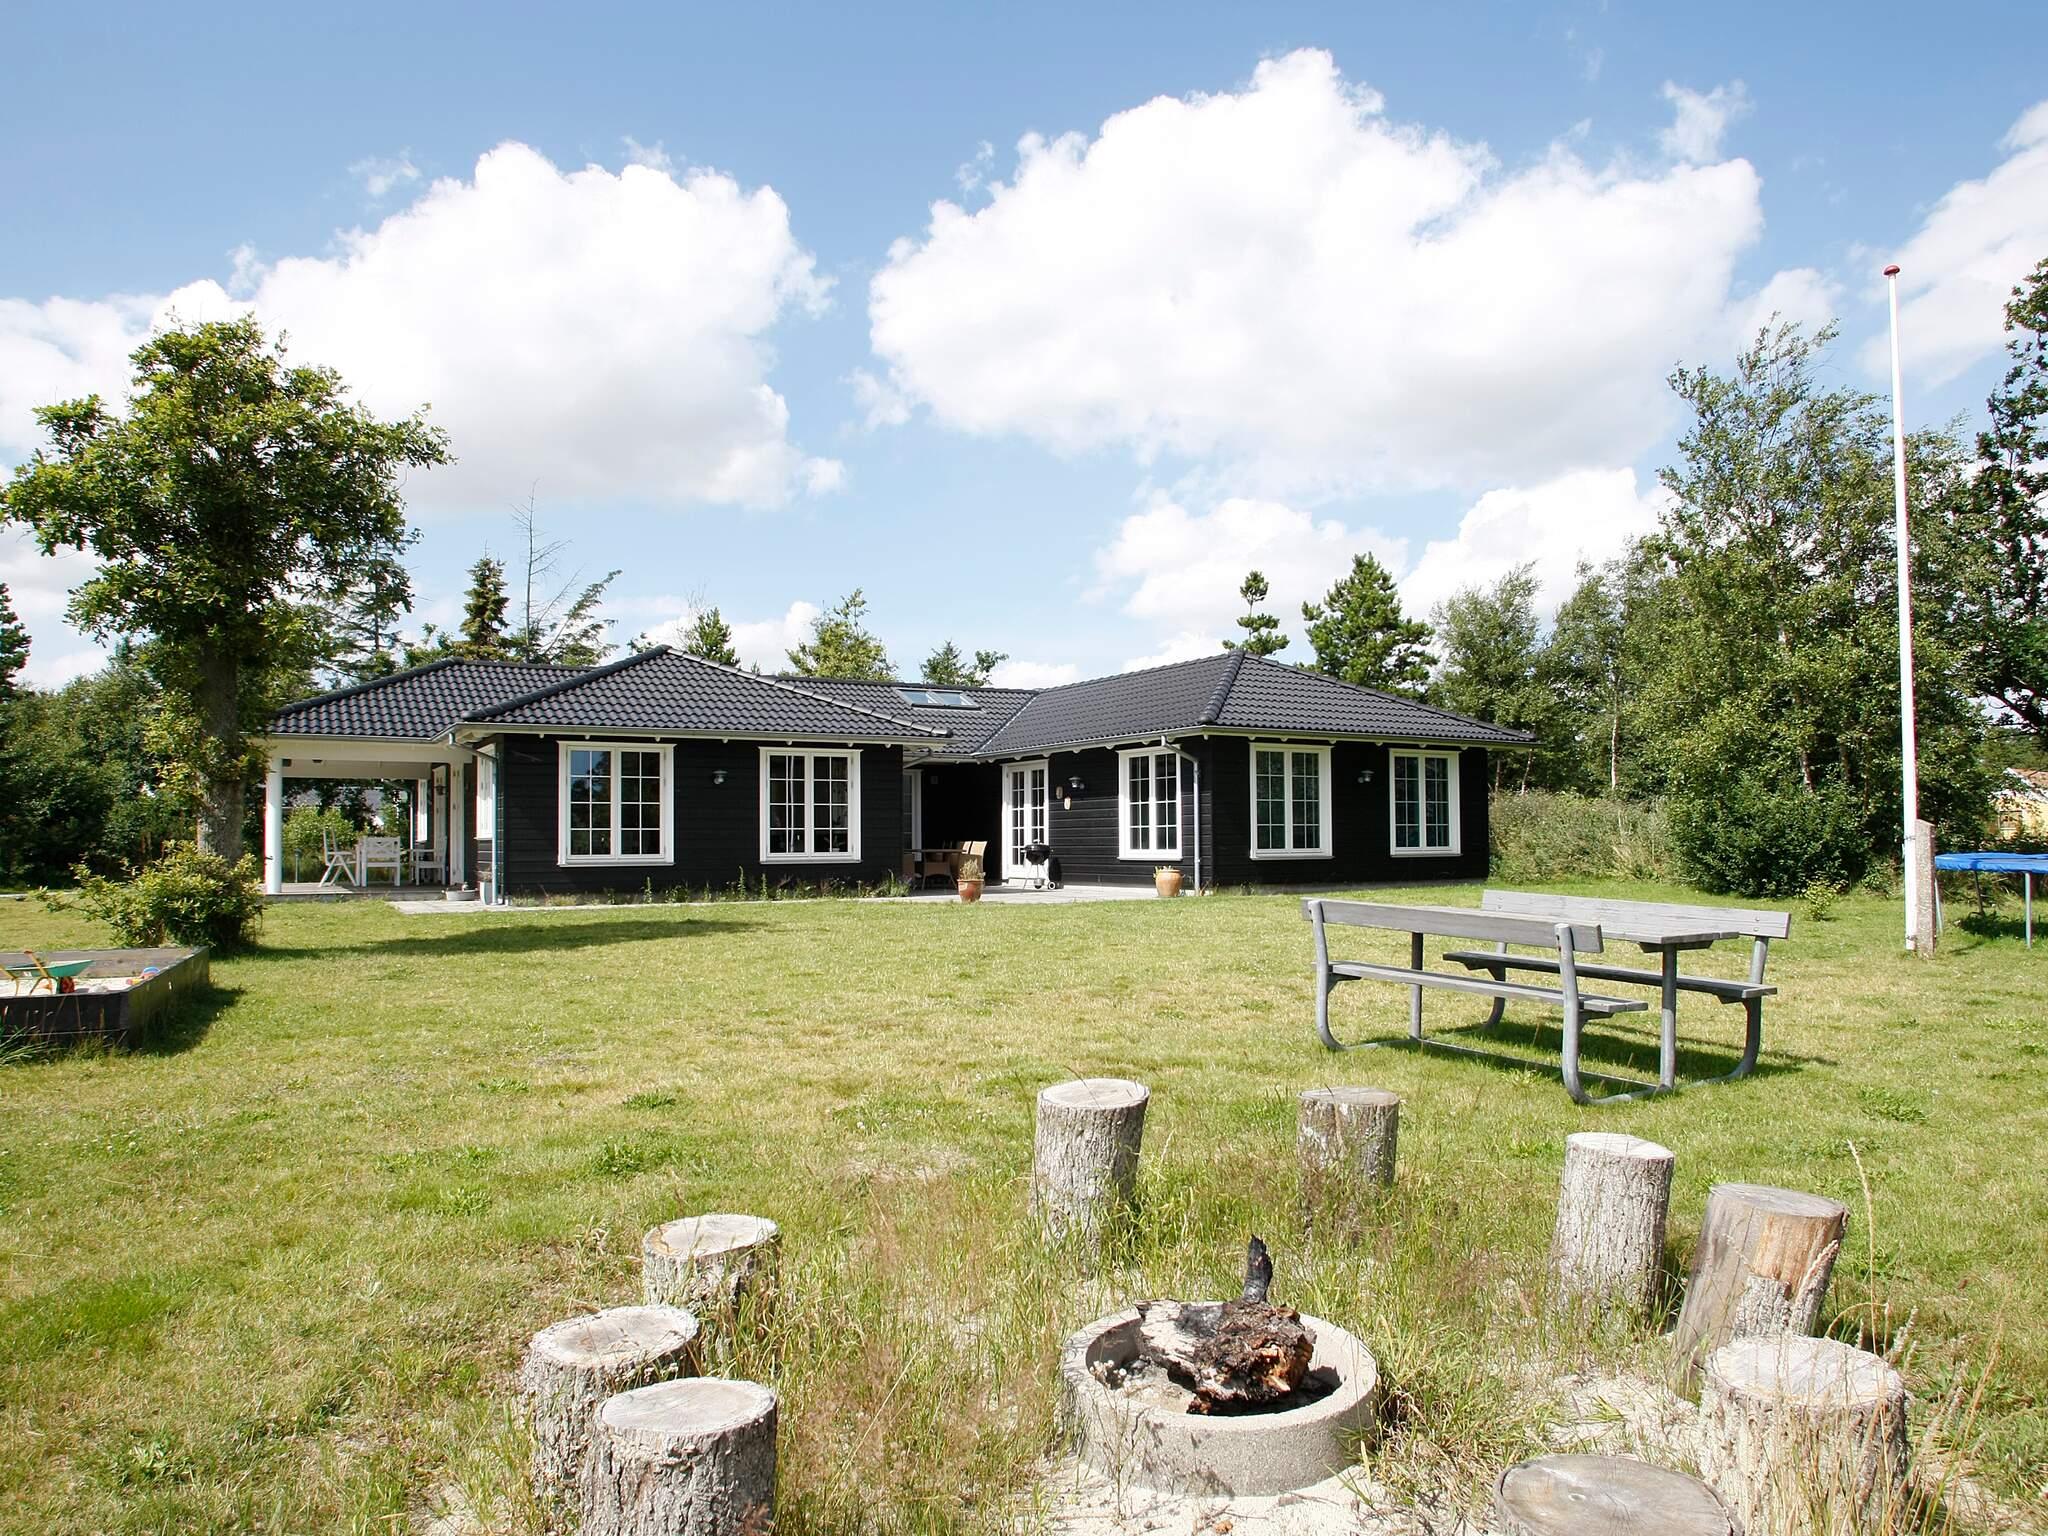 Ferienhaus Hou/Lagunen (317346), Hou, , Dänische Ostsee, Dänemark, Bild 21